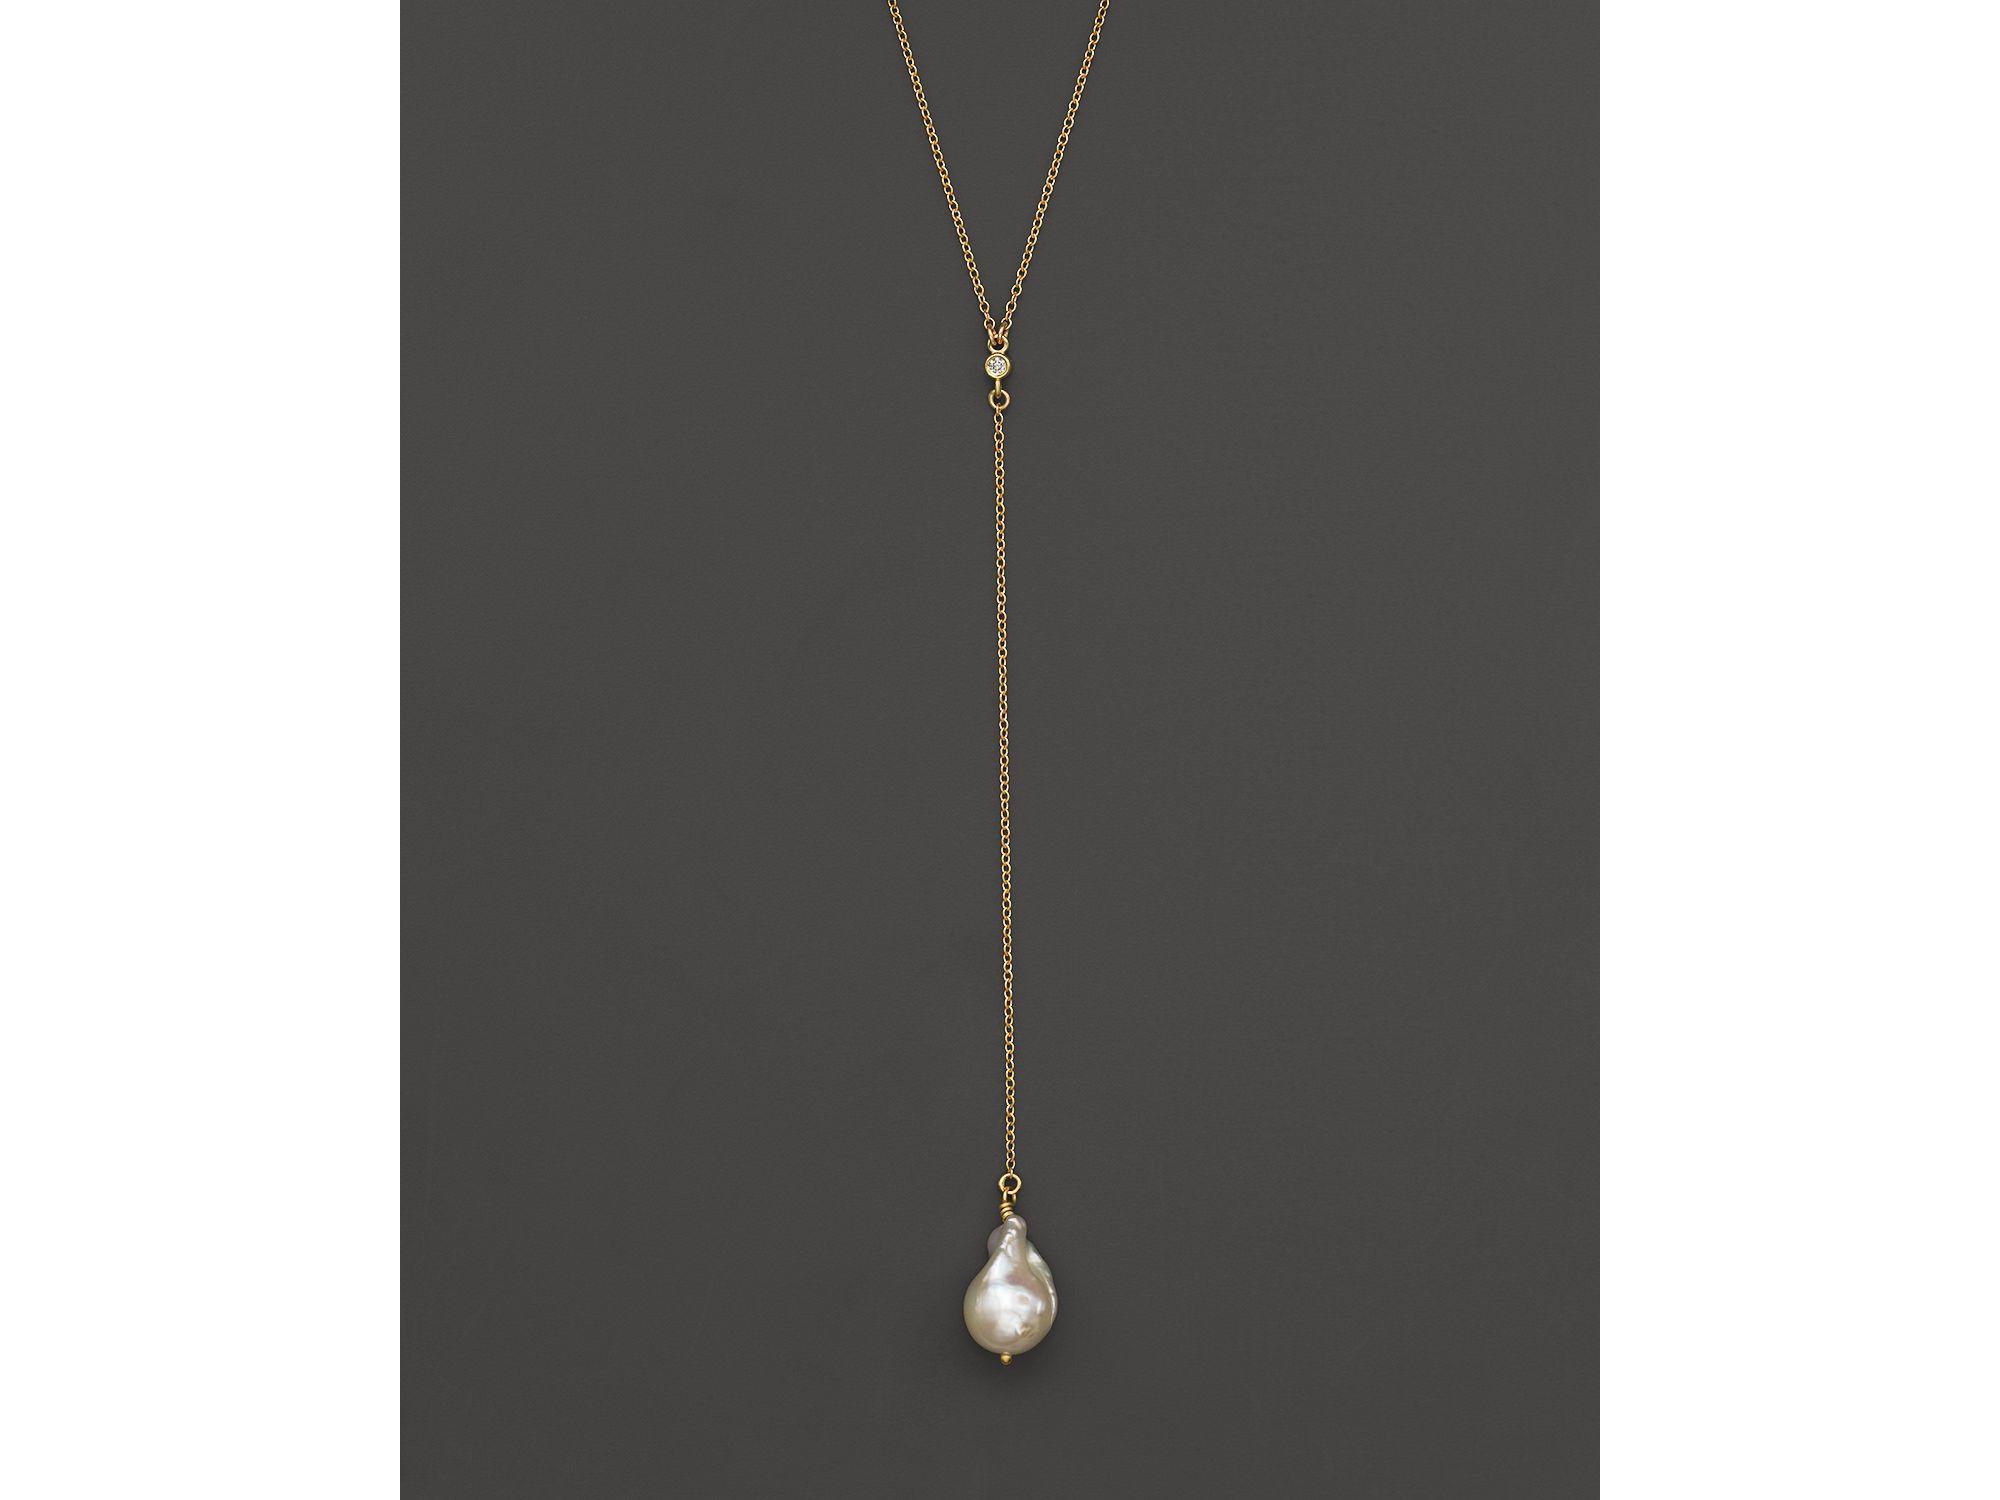 Lyst Mizuki 14k Yellow Gold Cultured Freshwater Pearl